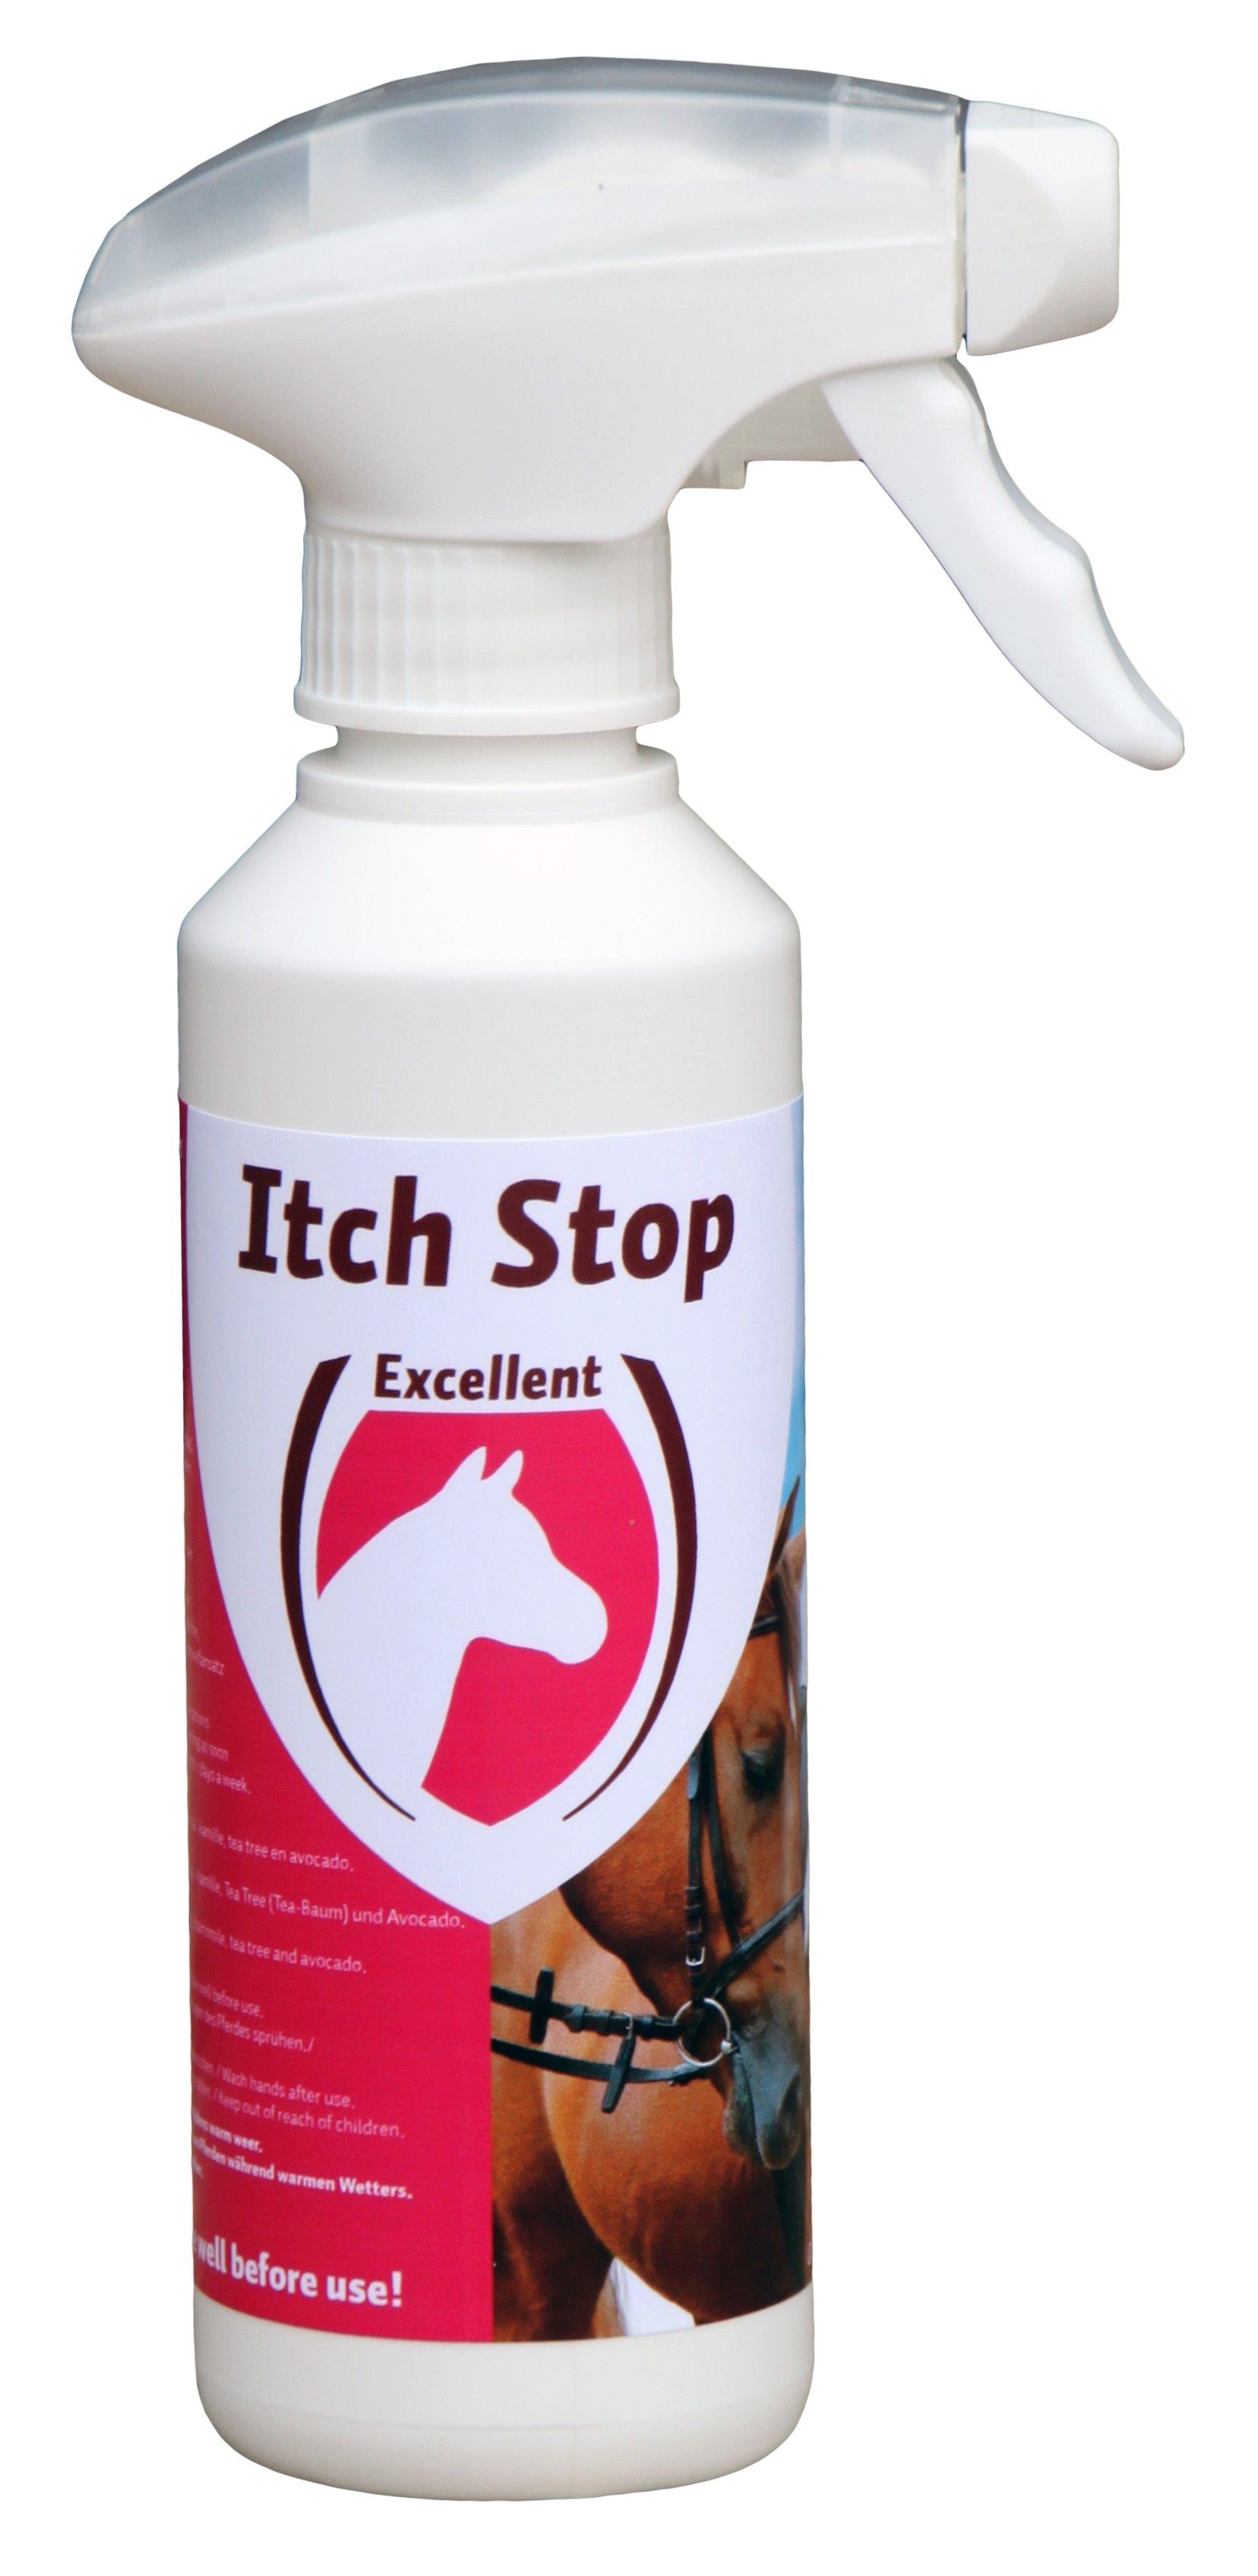 Itch Stop spray